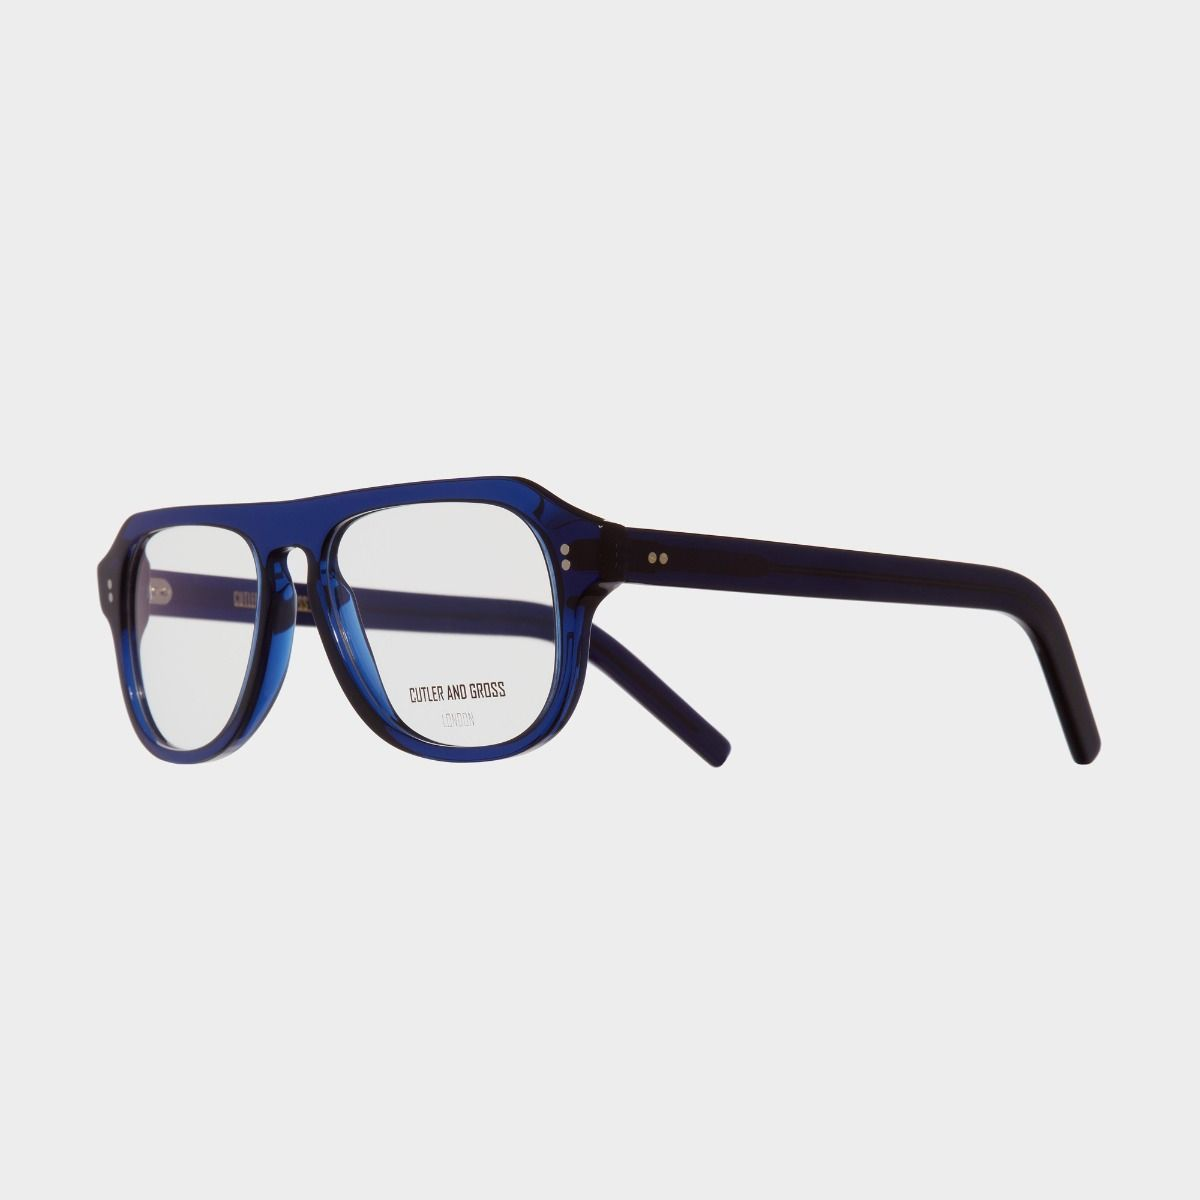 0822V3 Optical Aviator Glasses (Large)-Classic Navy Blue